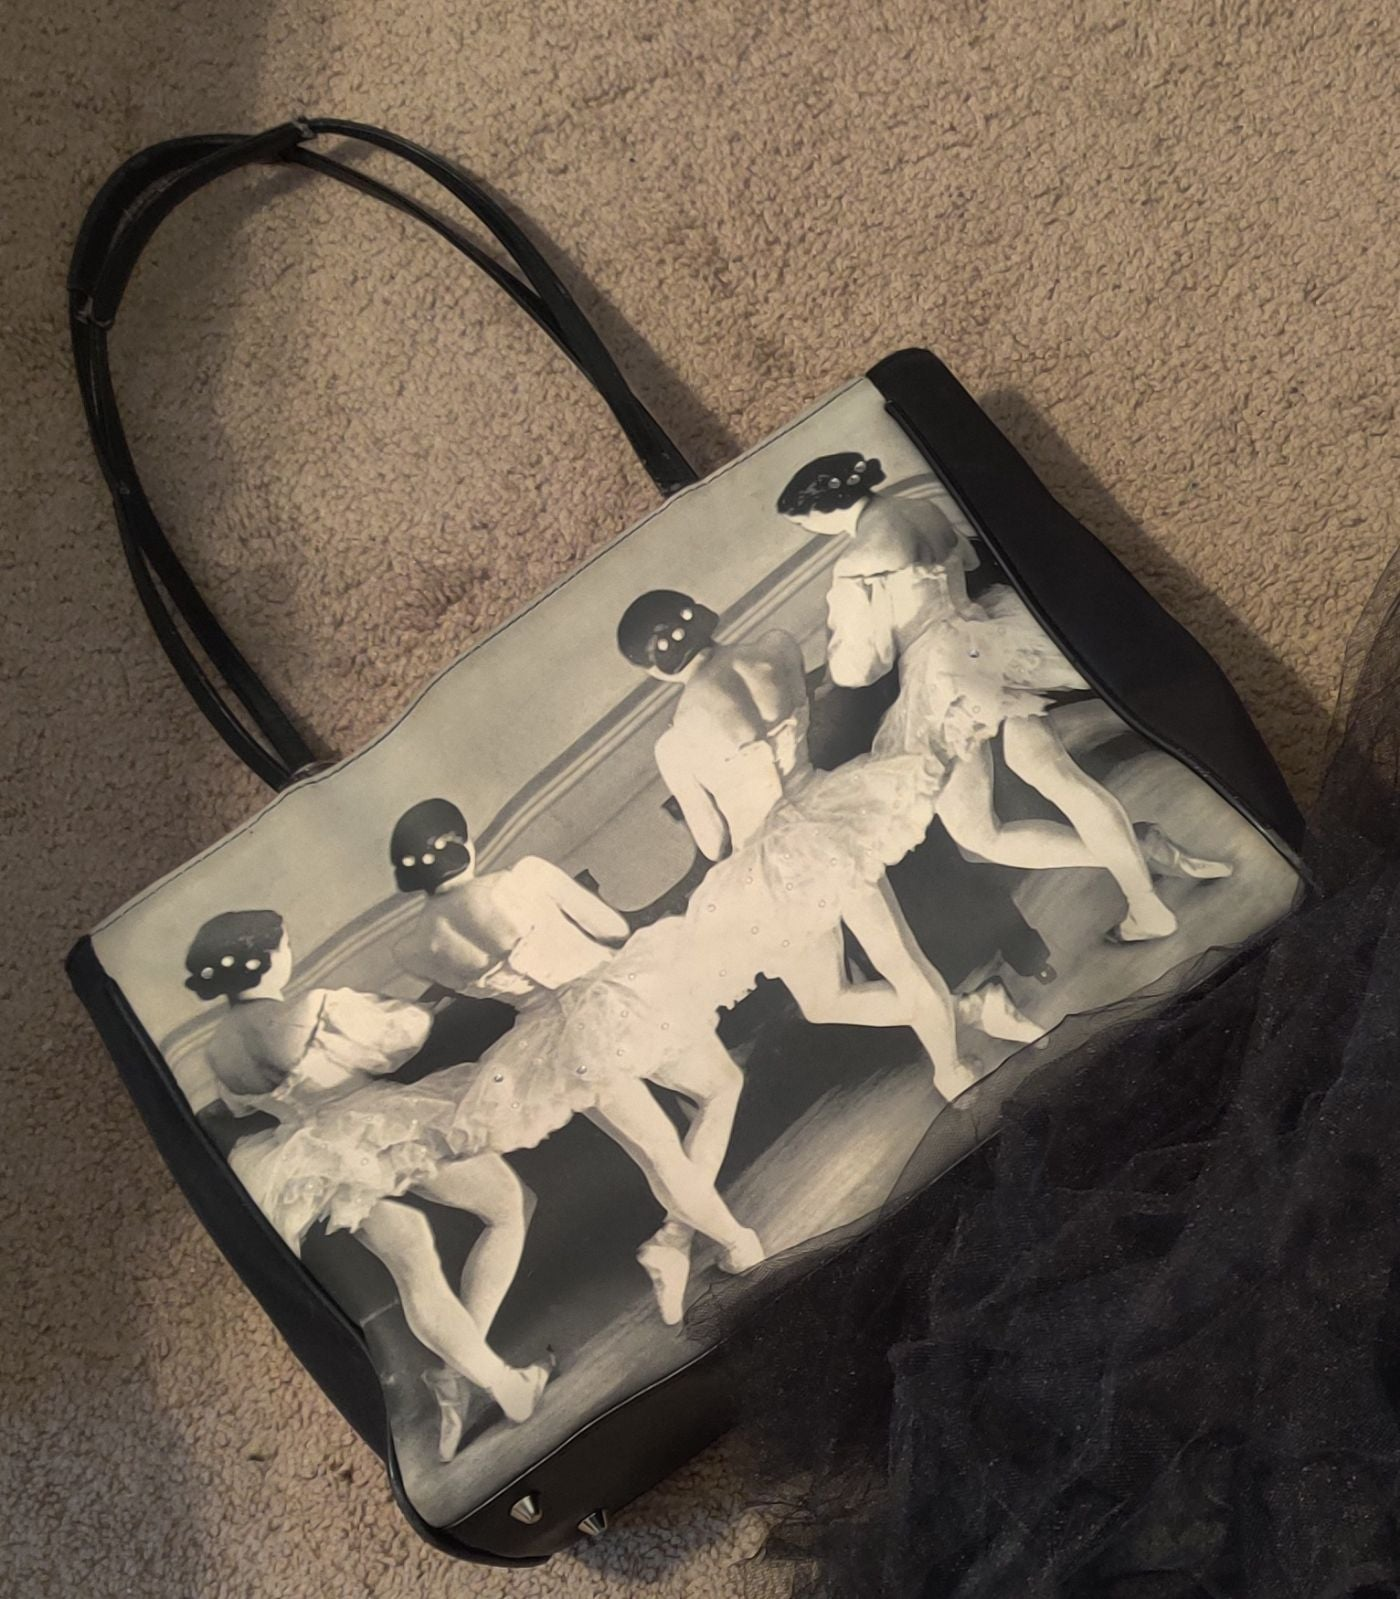 Ballerina handbag and two tulle shirts